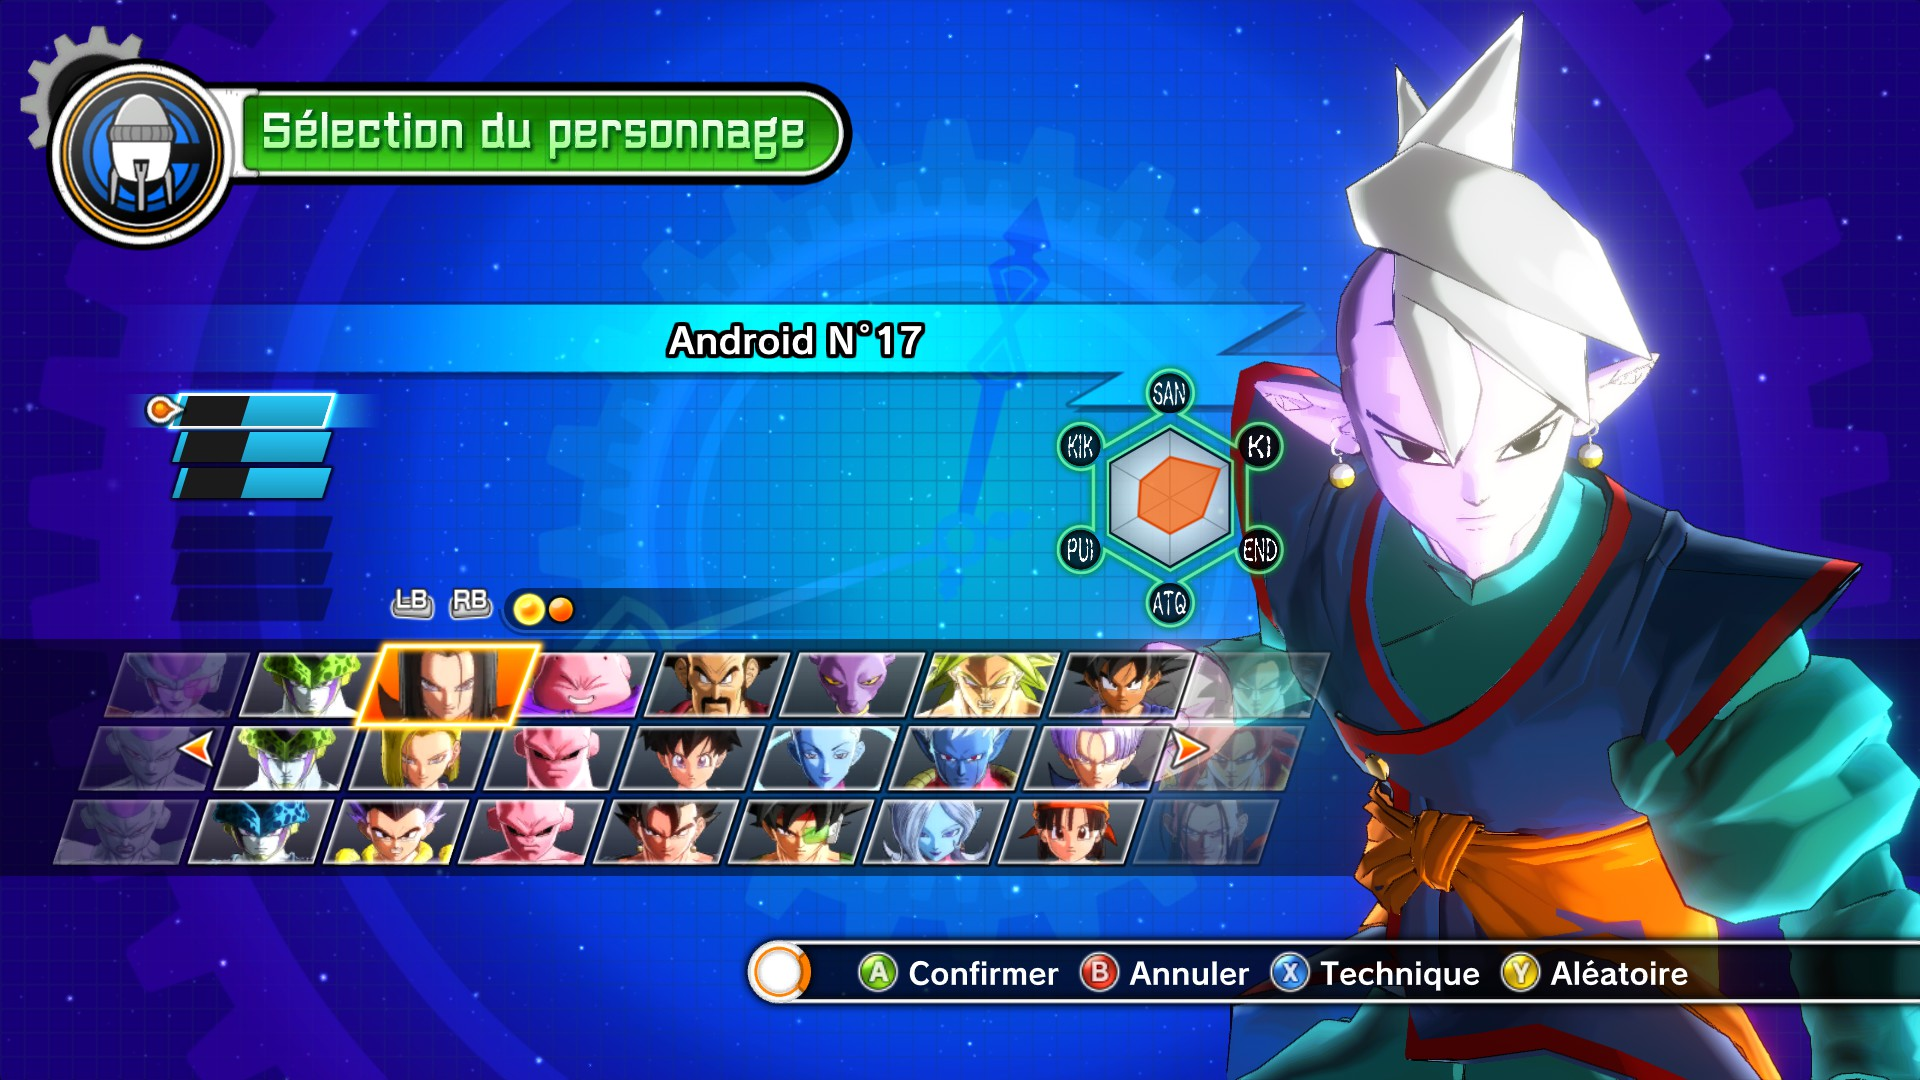 Hairstyles Xenoverse Mod : ... Jotaro Kujos Hairstyle for CaC. (W.I.P) Dragon Ball Xenoverse Mods